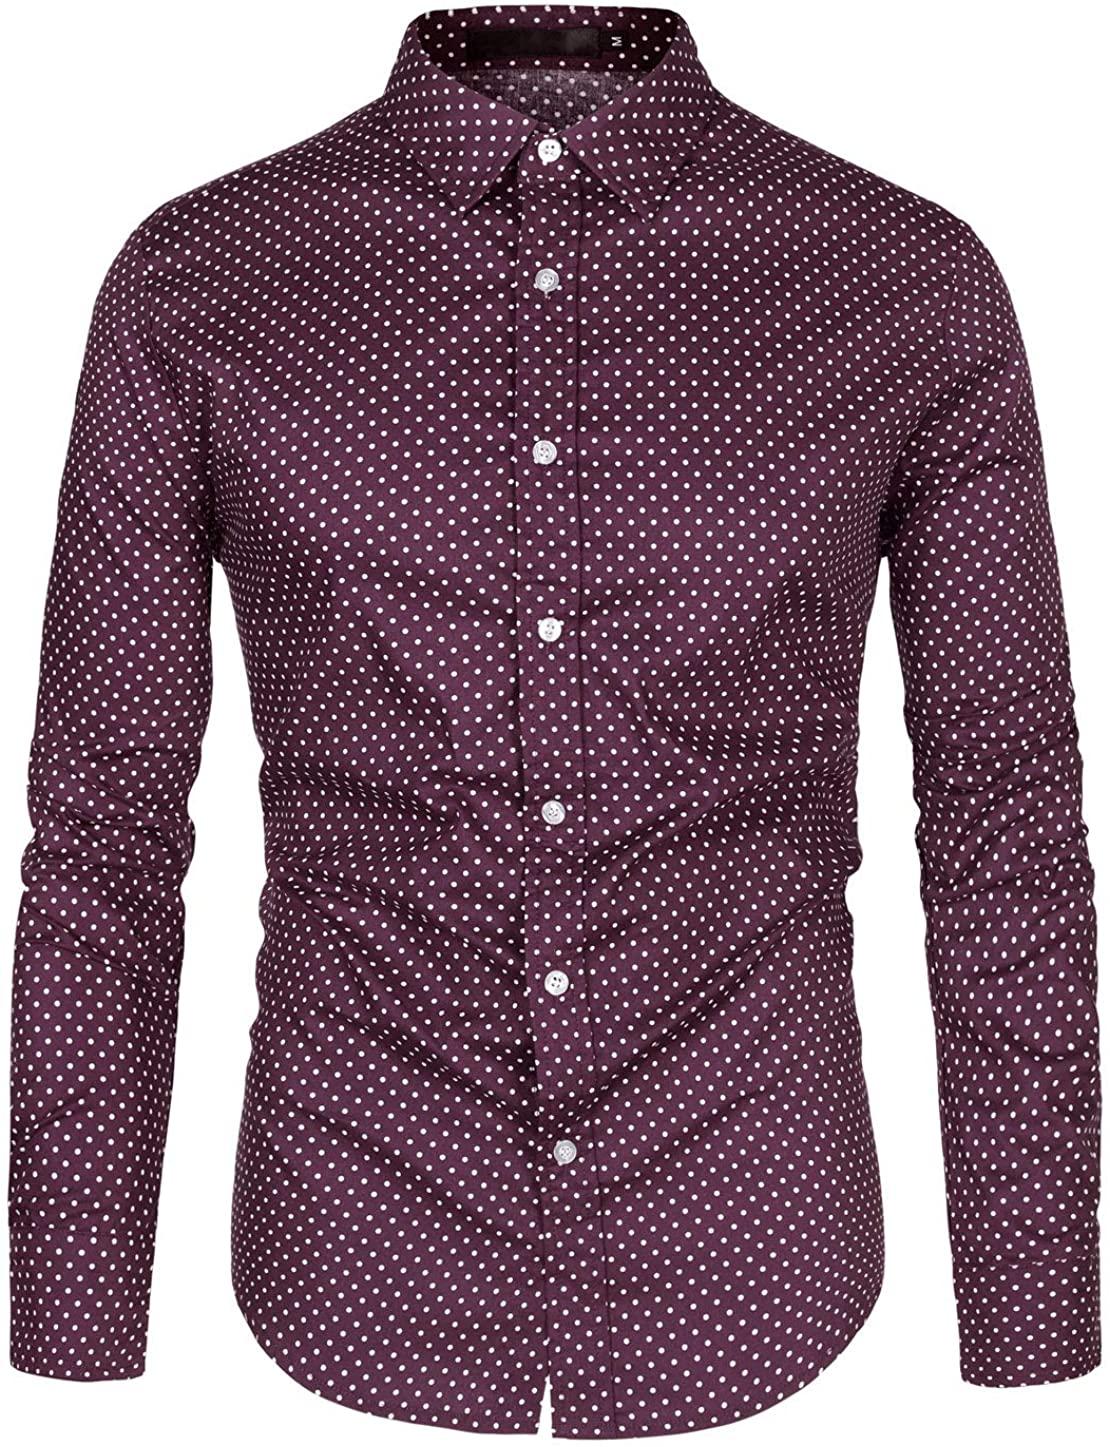 uxcell Men's Printed Dress Shirt Cotton Polka Dots Long Sleeve Button Down Business Casual Shirt